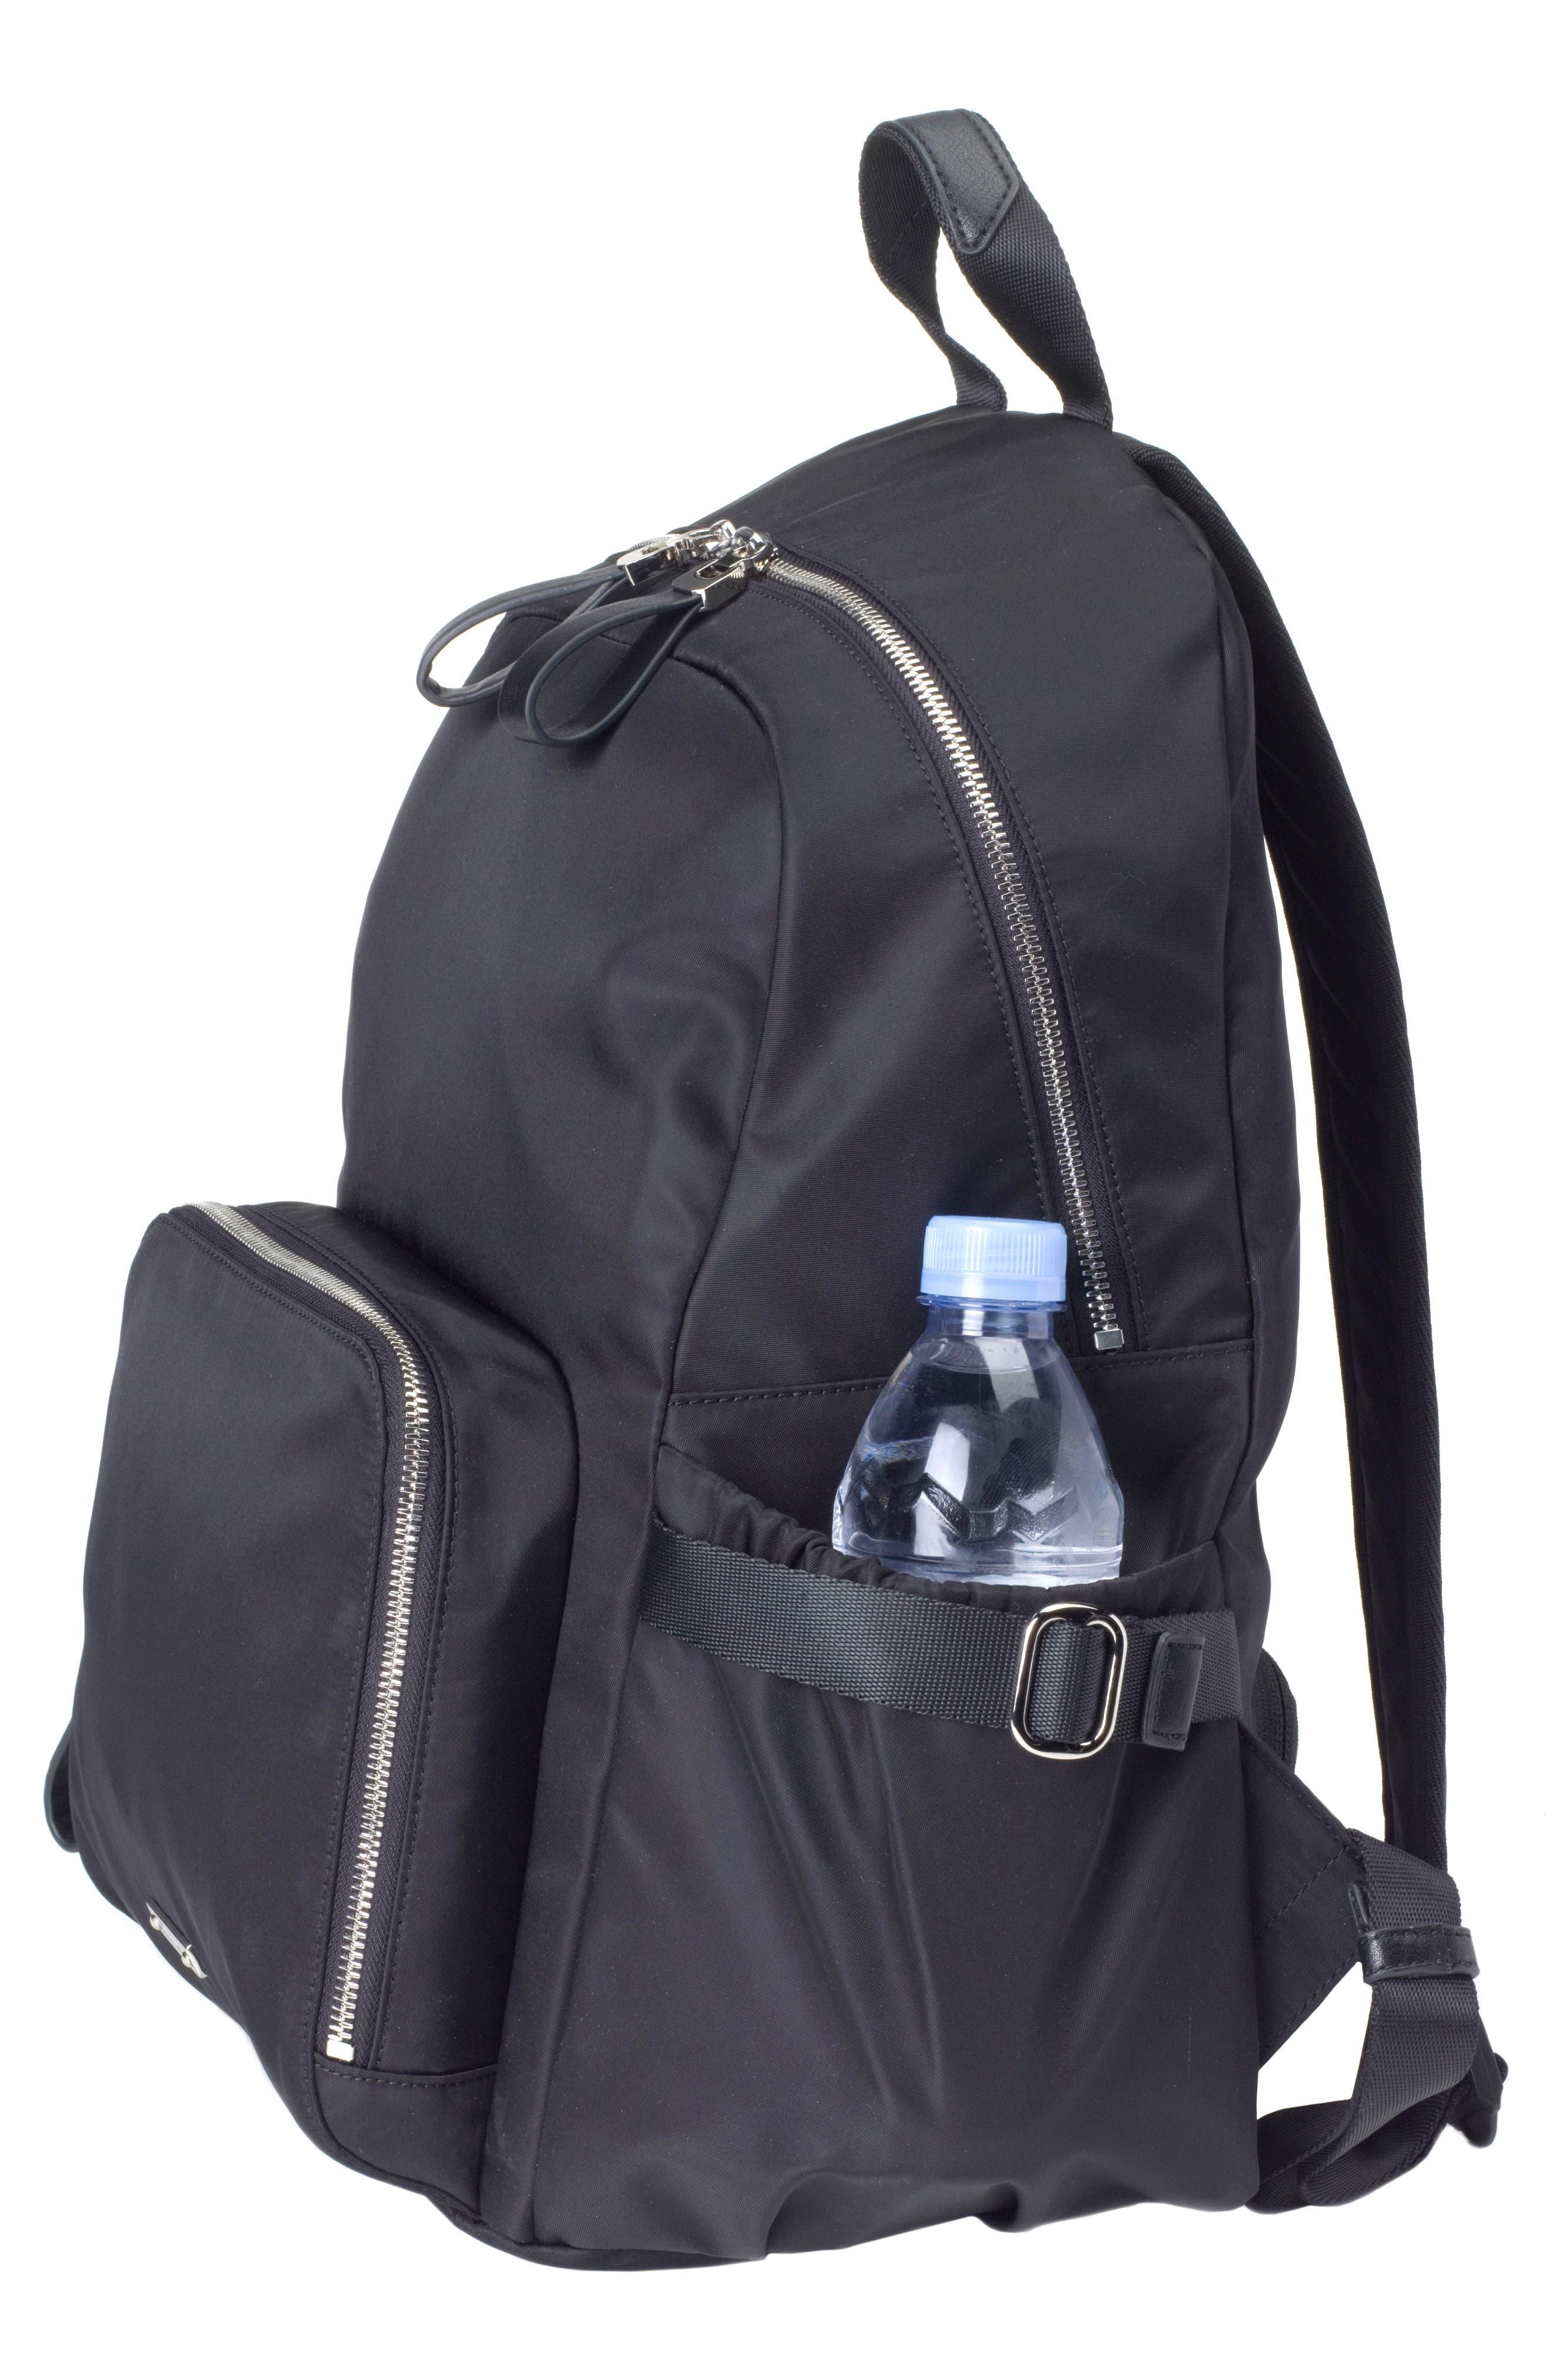 Hero Water Resistant Nylon Backpack Diaper Bag,                             Alternate thumbnail 13, color,                             BLACK